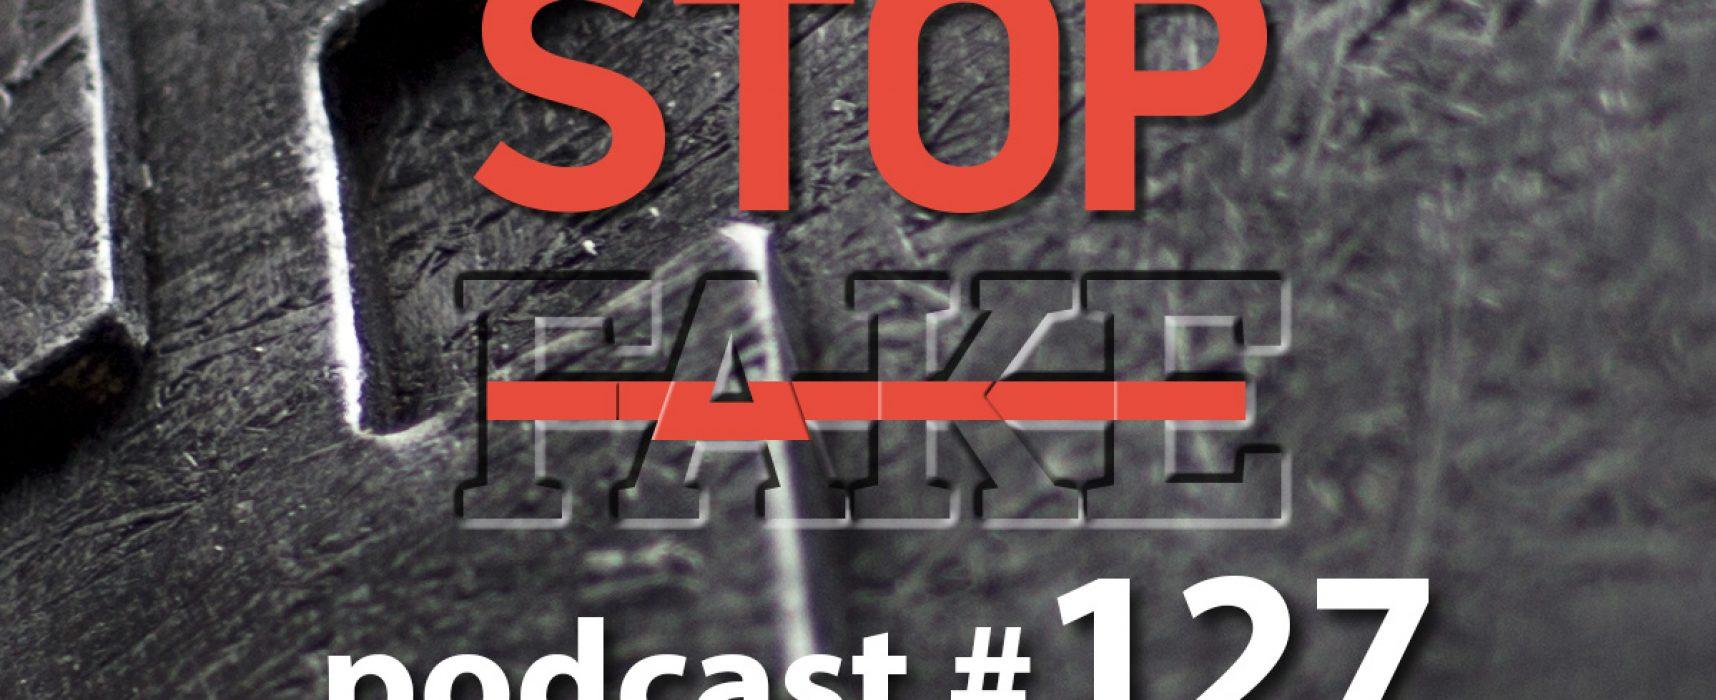 StopFake podcast #127